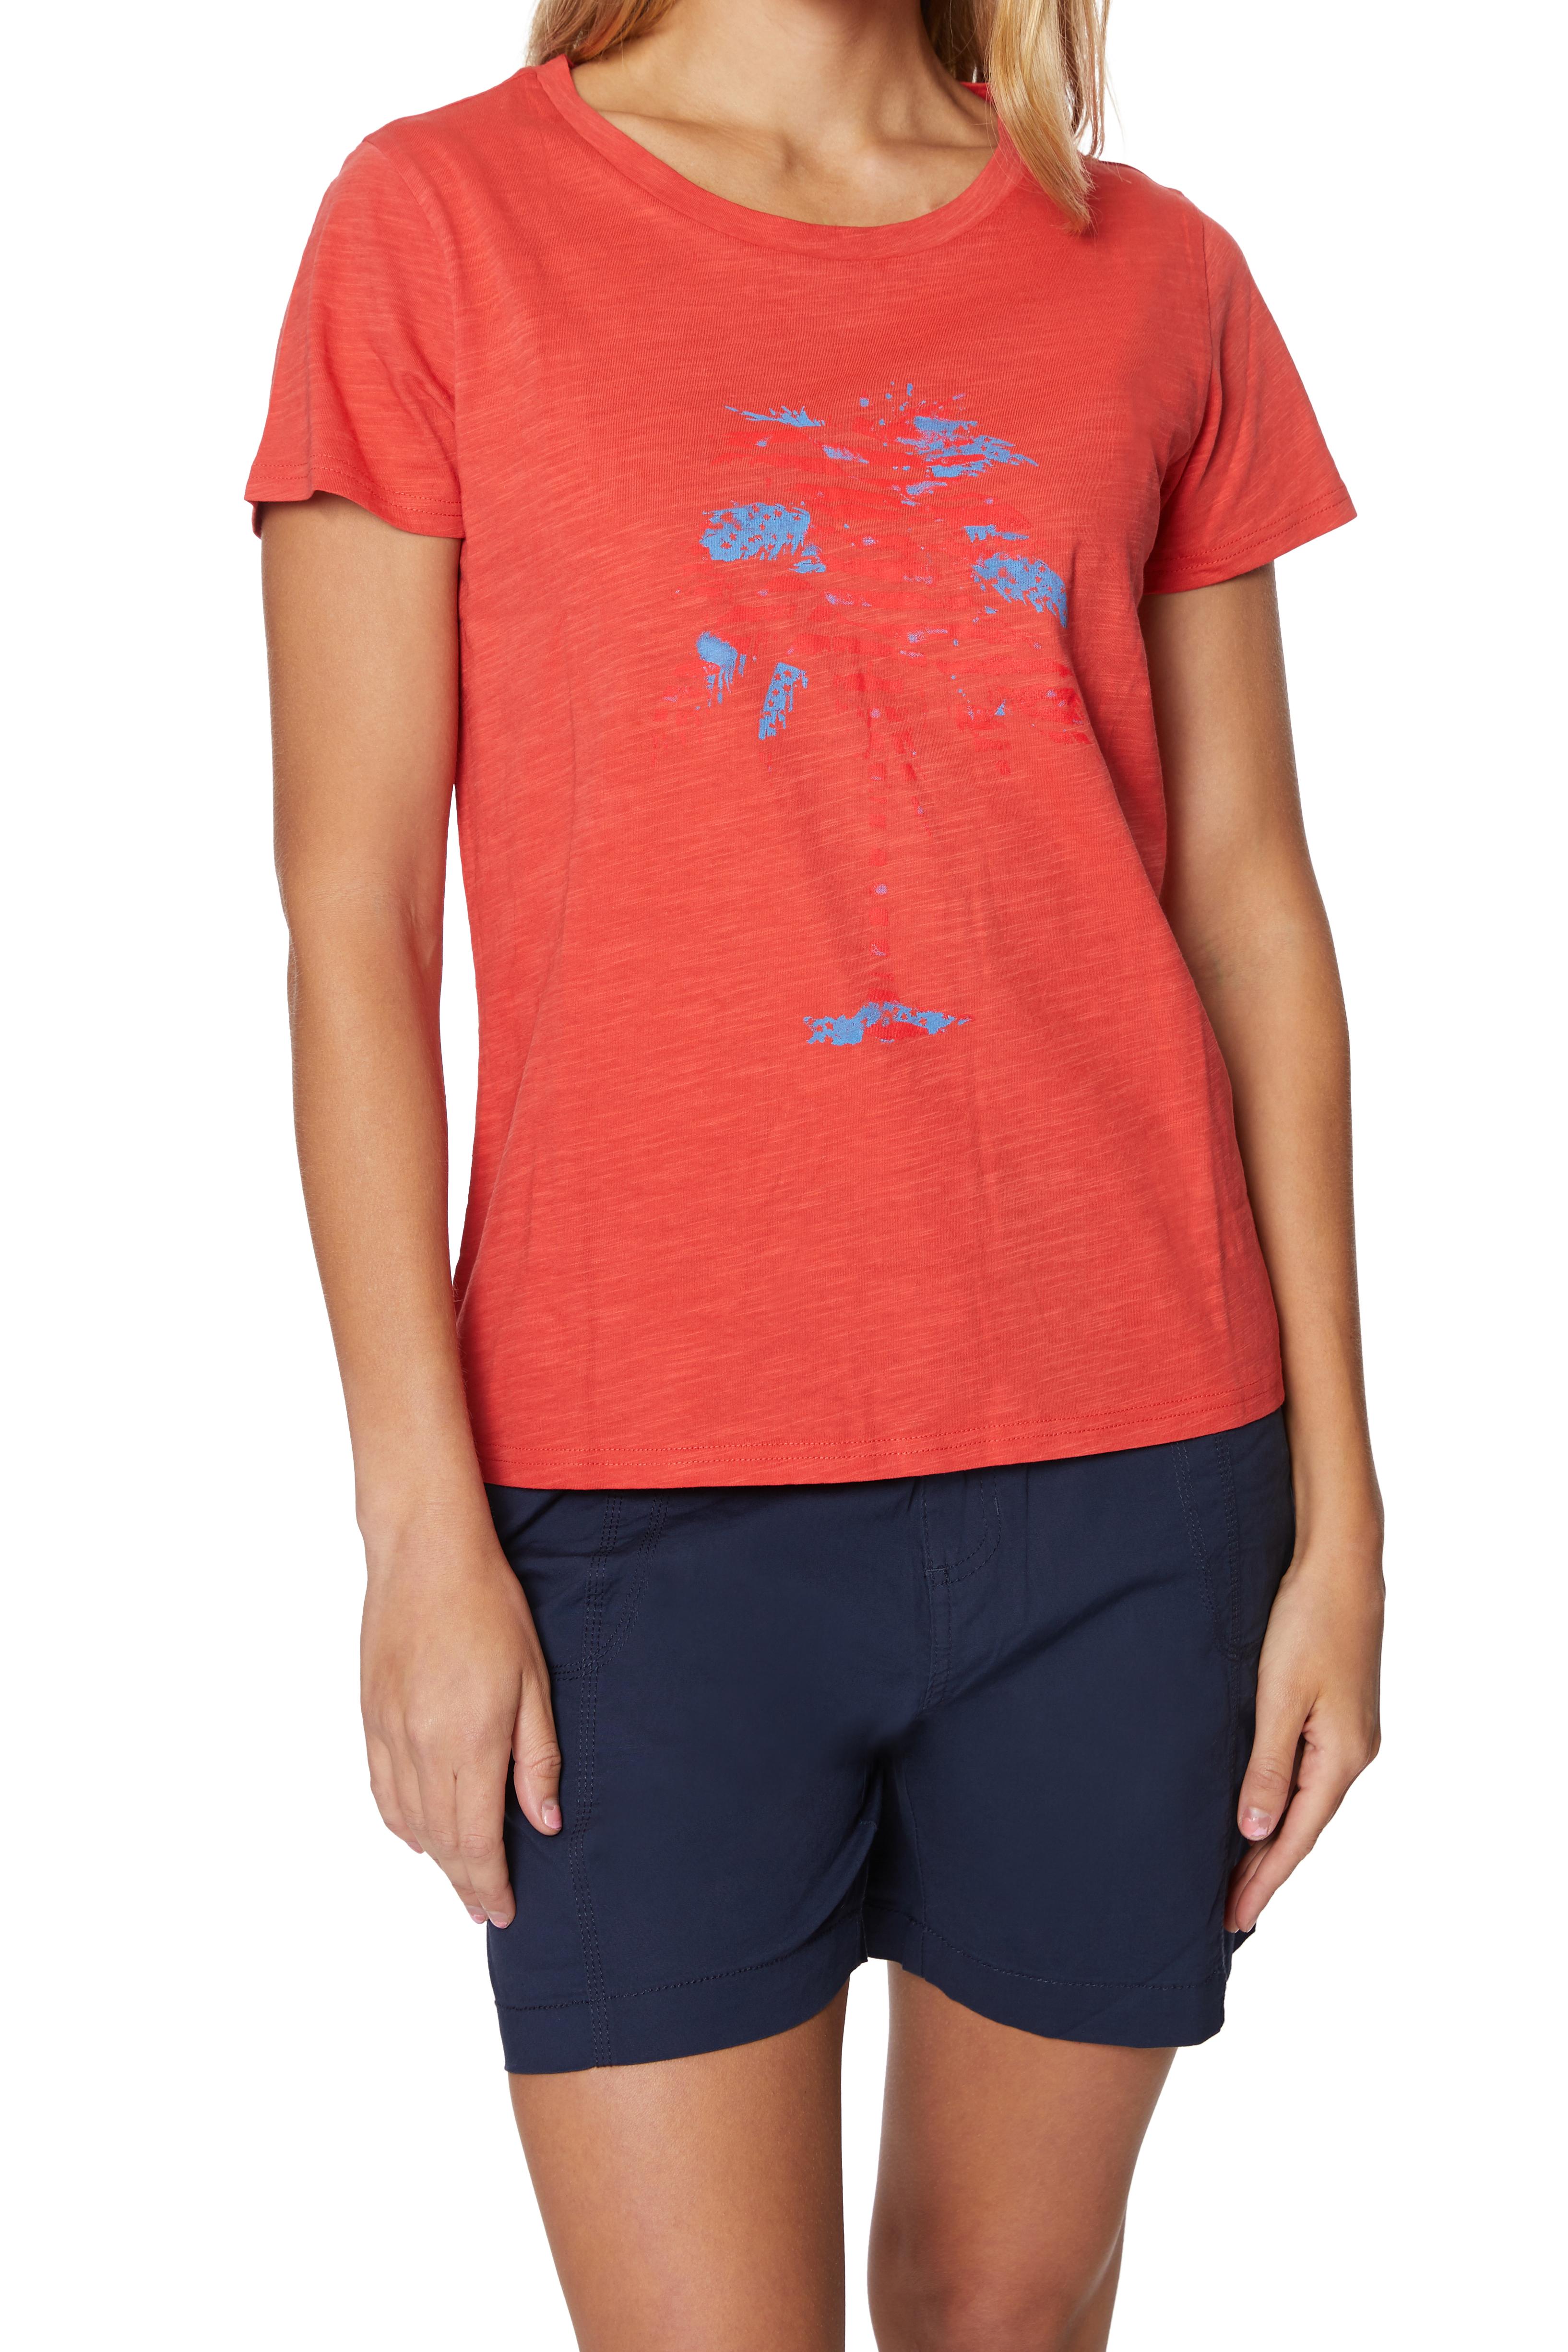 Caribbean Joe® Screen Print Knit T-Shirt -Poppy - Front